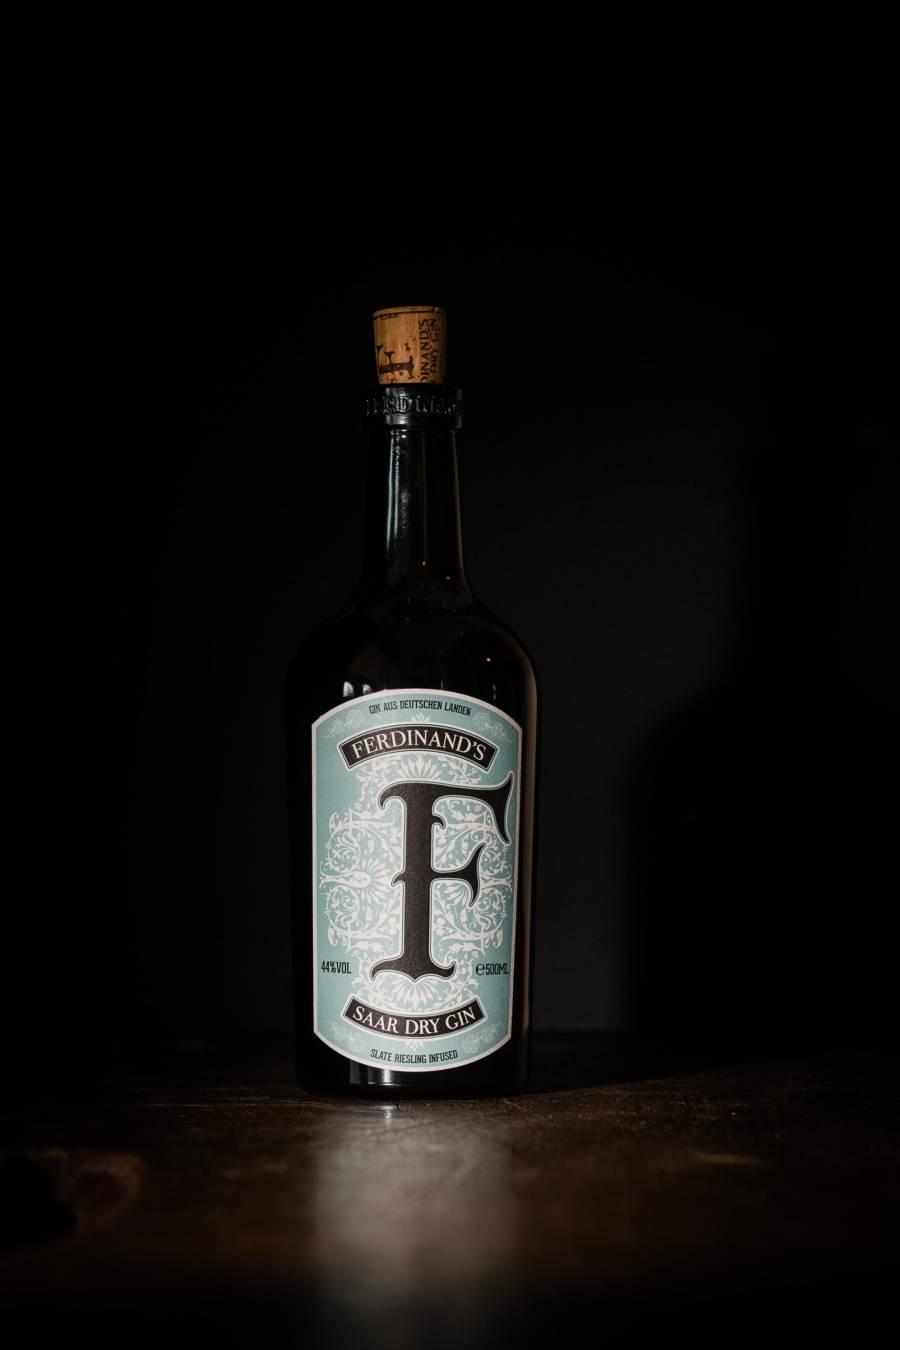 Ferdinand Dry Gin